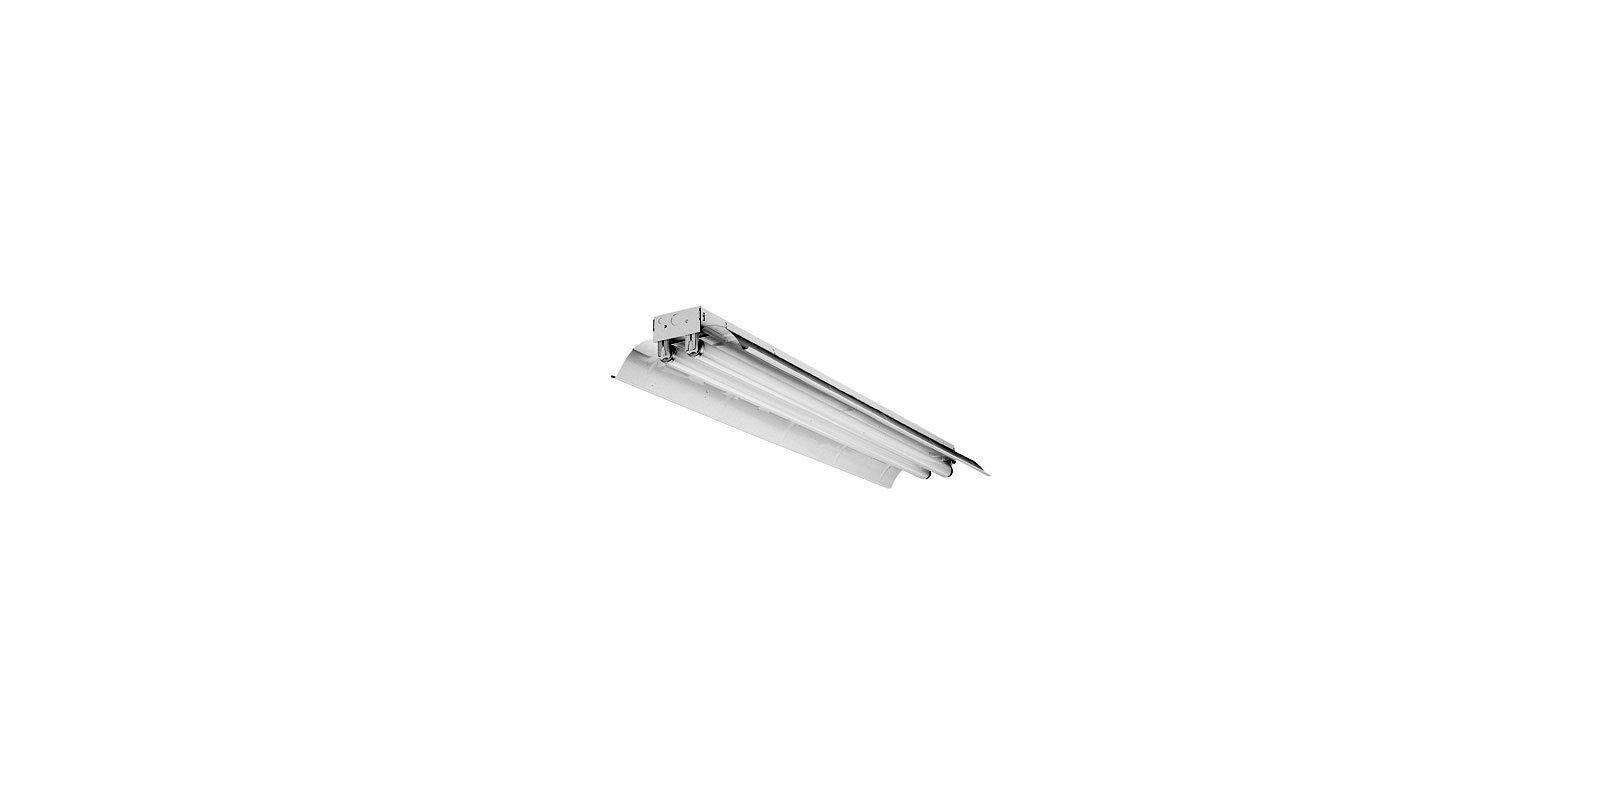 Lithonia Lighting L 2 32 MVOLT GEB10IS 2 Light Linear Recessed Fluorescent Fixtu White Commercial Lighting Ceiling Lights Strip Lights